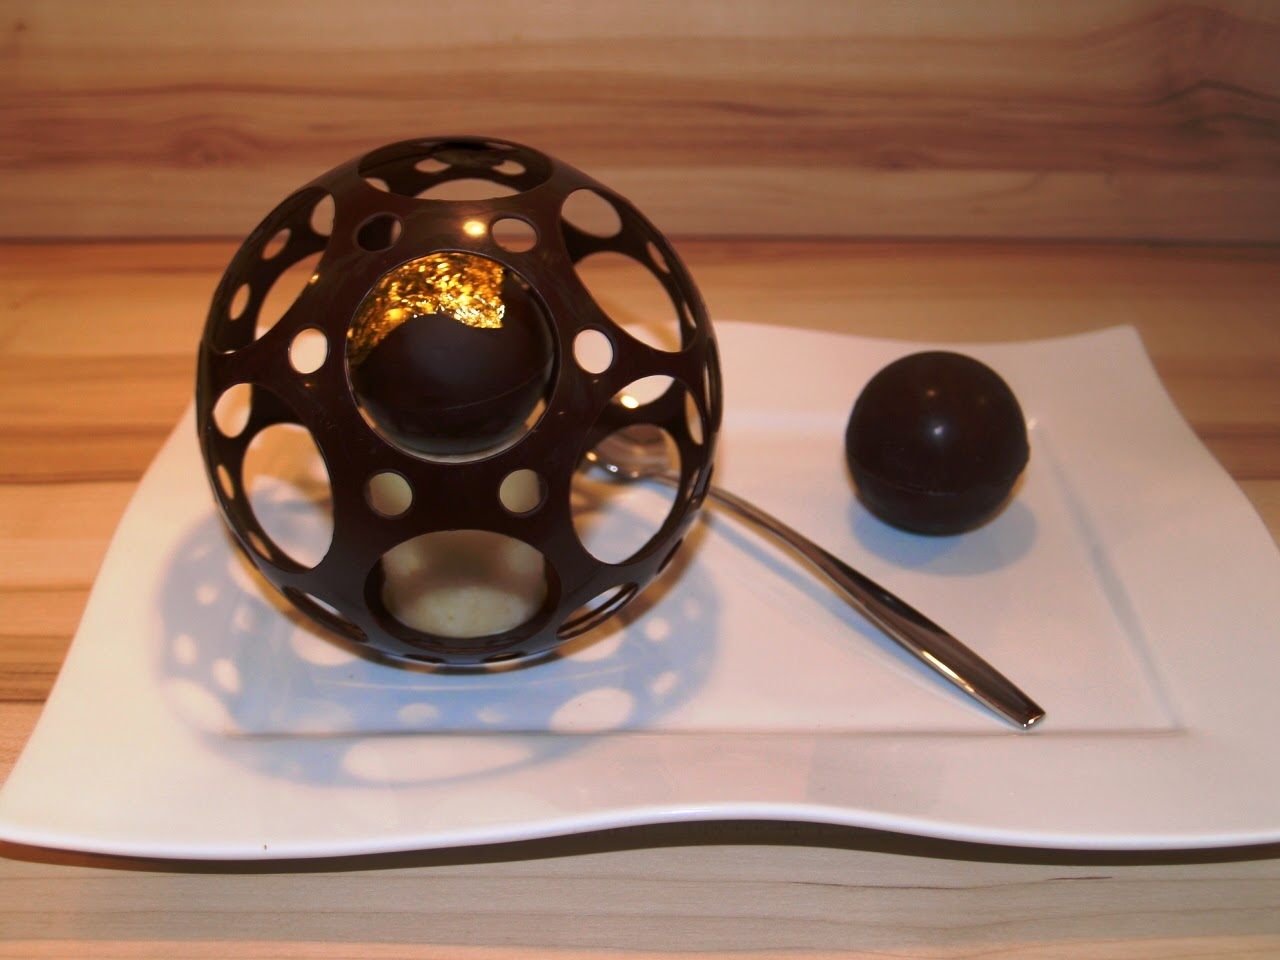 demi sphère chocolat facile